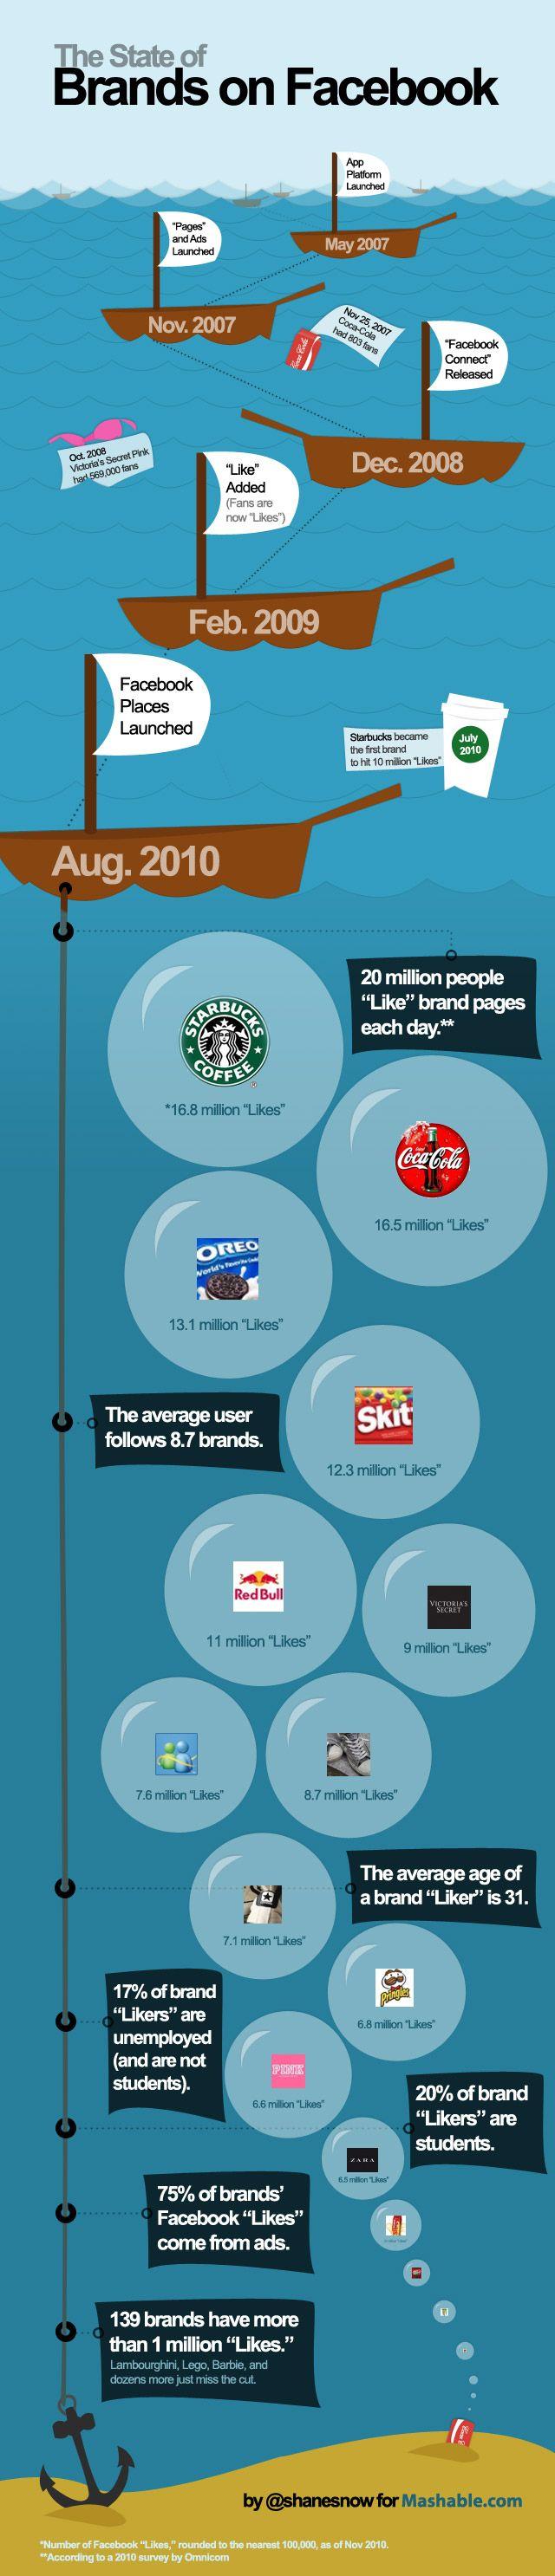 Brands on FacebookSocial Network, Biggest Brand, Social Media, Media Infographic, Socialmediamarketing Facebook, Facebook Marketing, Facebook Infographic, Facebook Brand, Brand Infographic